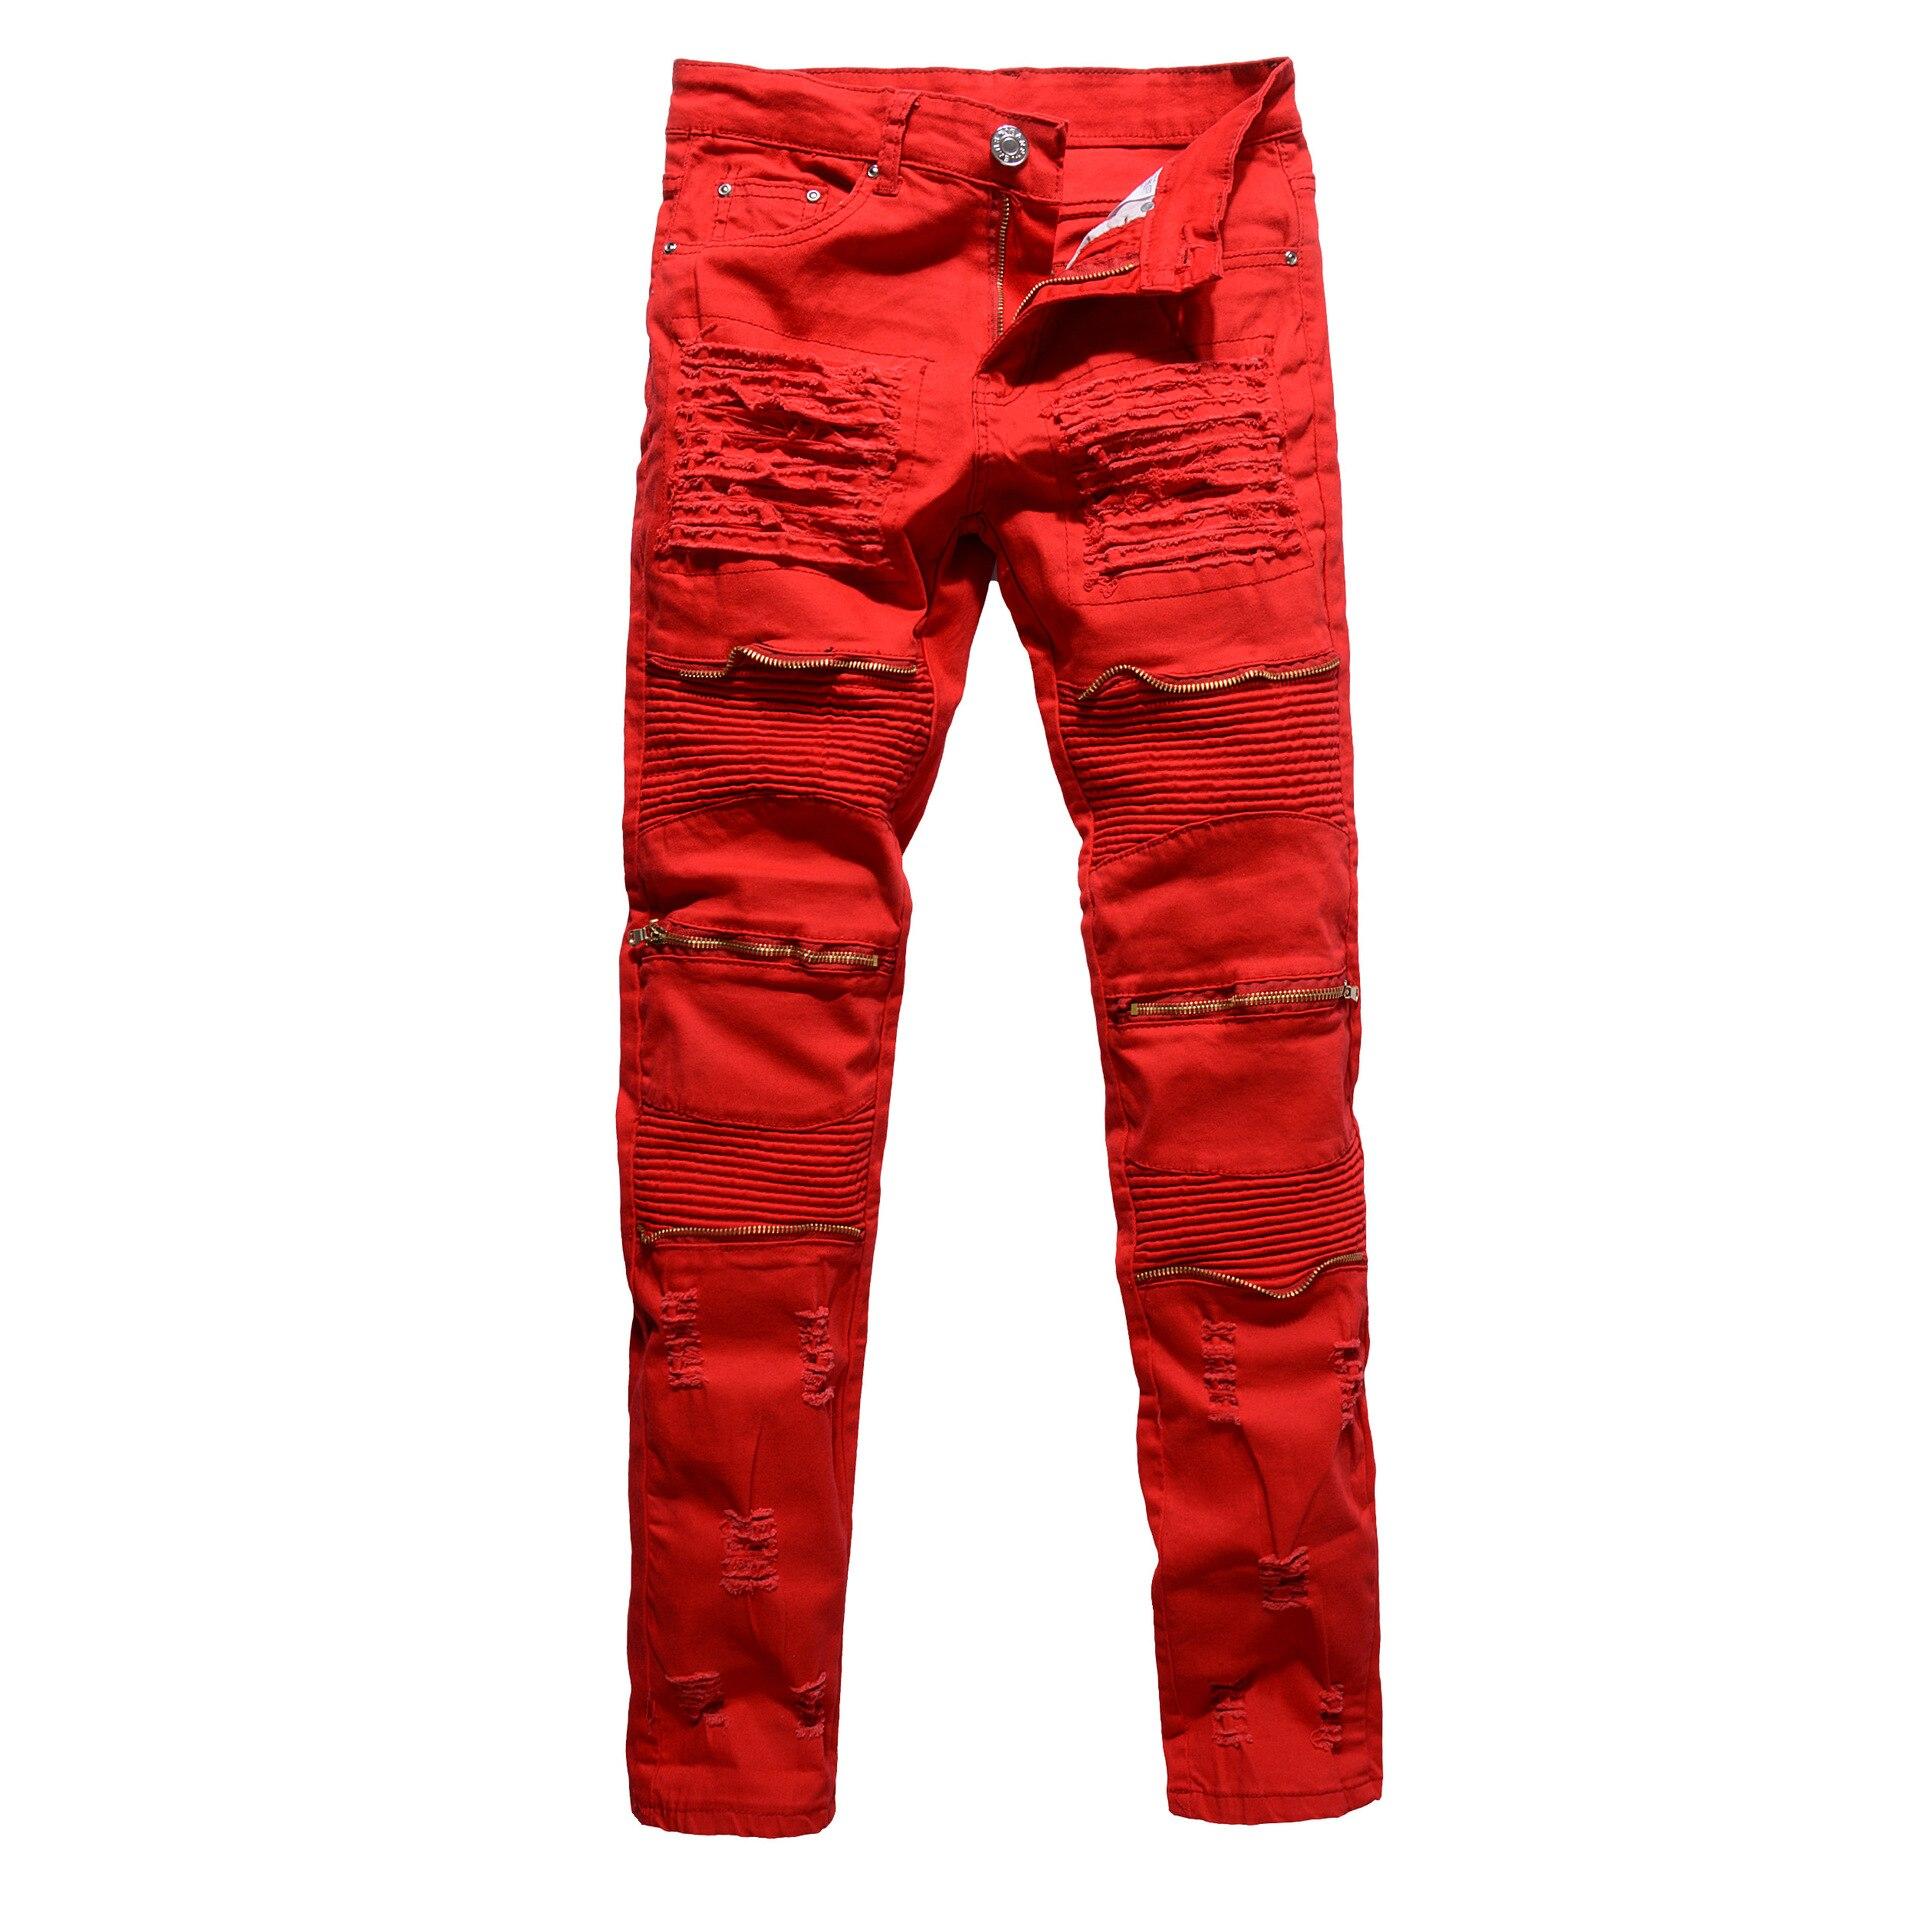 Idopy Mens Male Club Biker Jeans White /red/black Knee Multi Zipper Men Brand Slim Fit Cut Destroyed Jean Pants For Male Homme